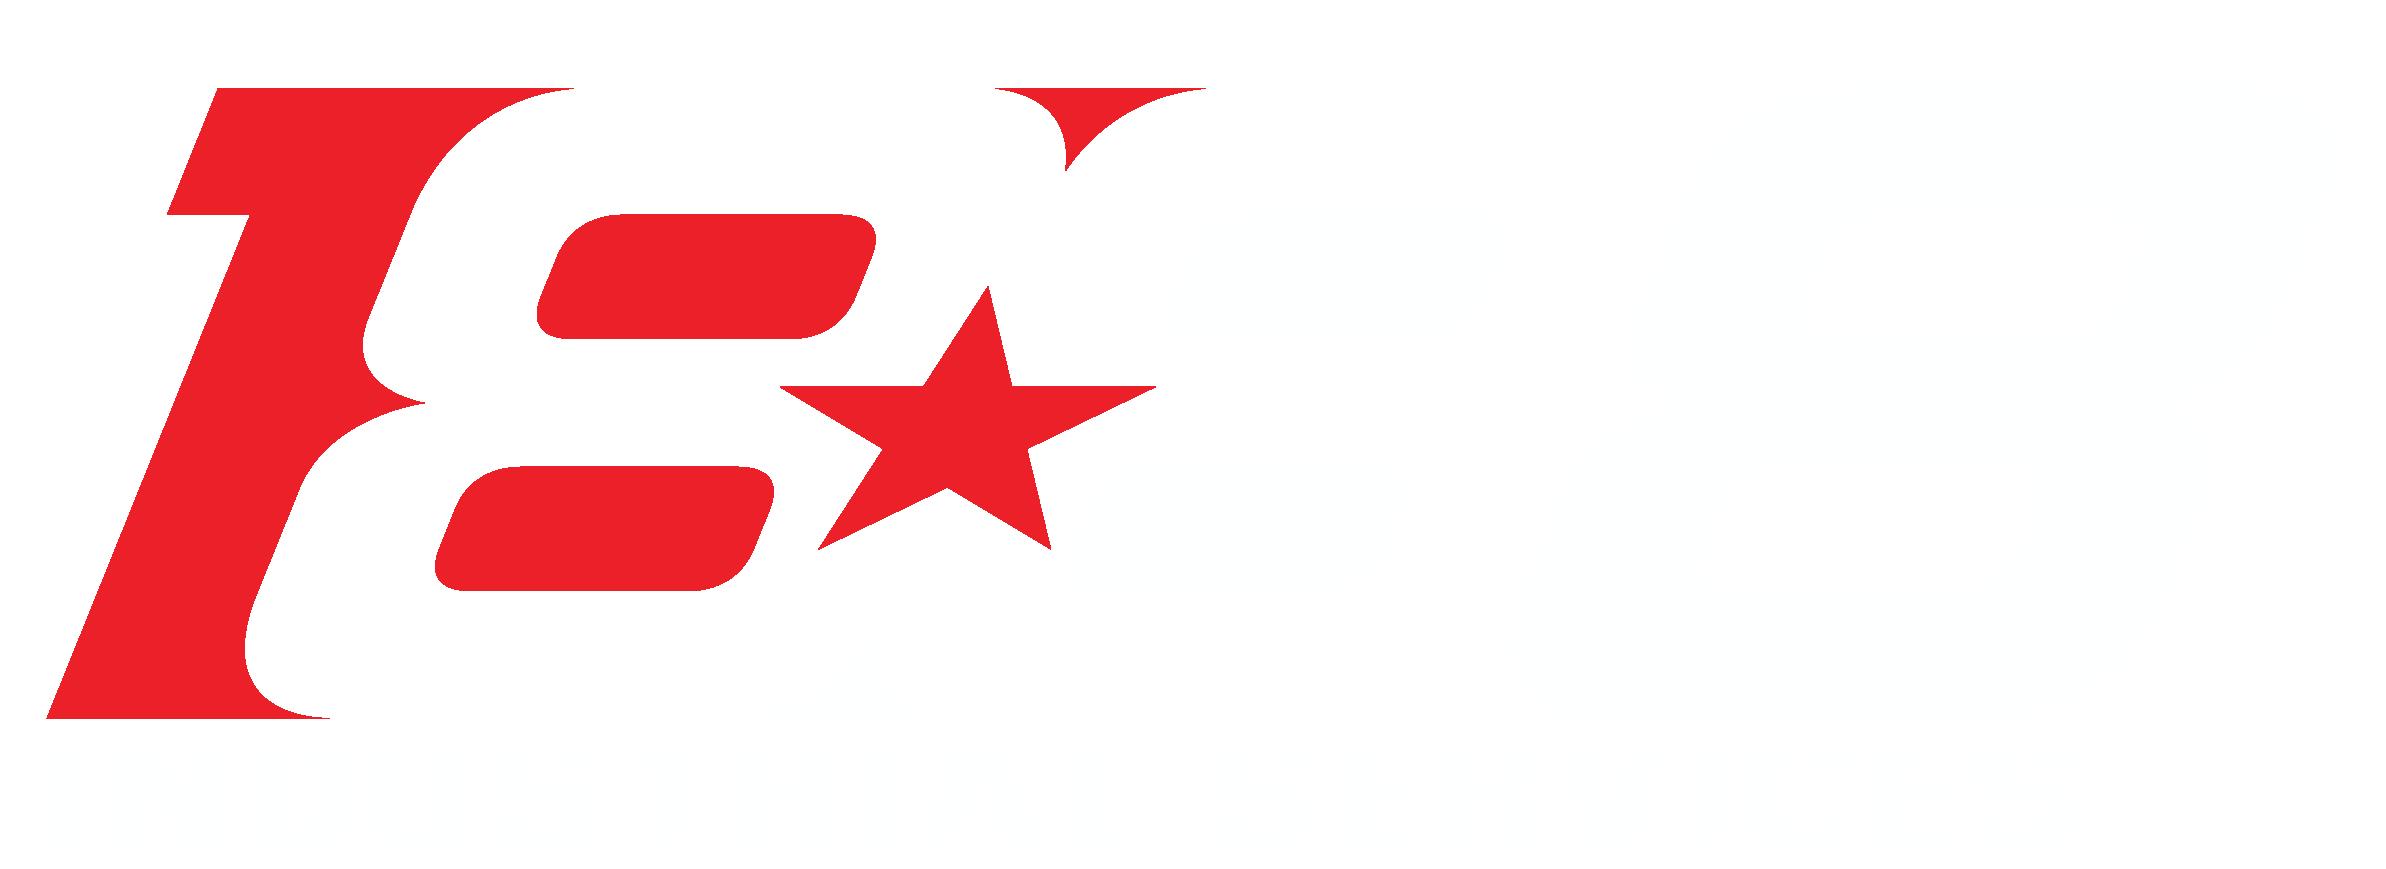 1888logoclean2-02.png